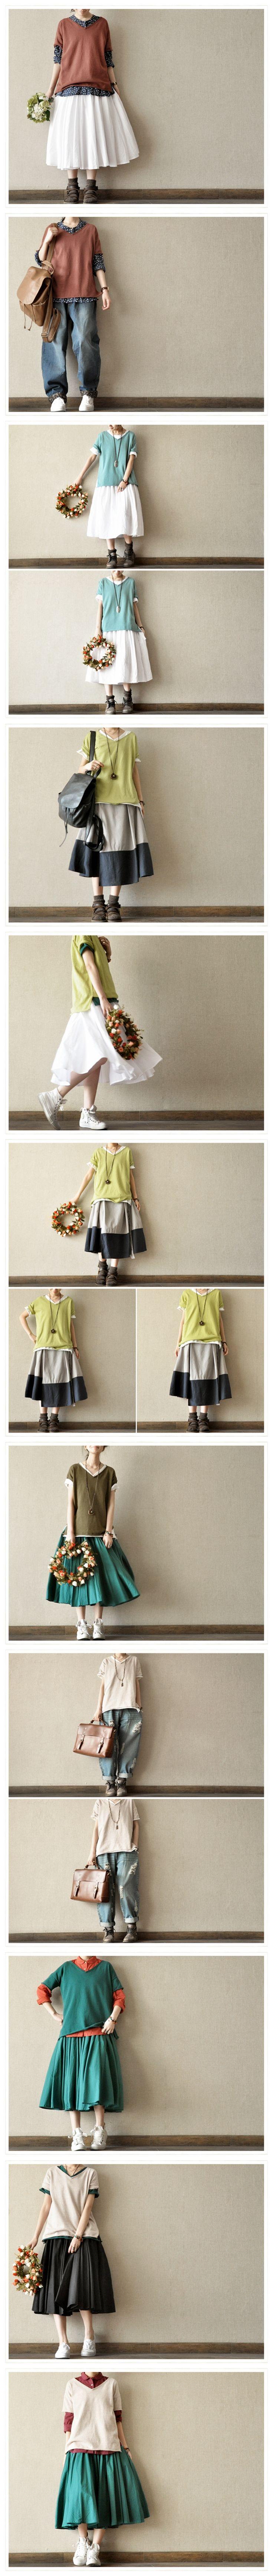 Three Colours Knitwear T-shirt Cotton Top Summer Blouse Women Clothes by Fantasylinen